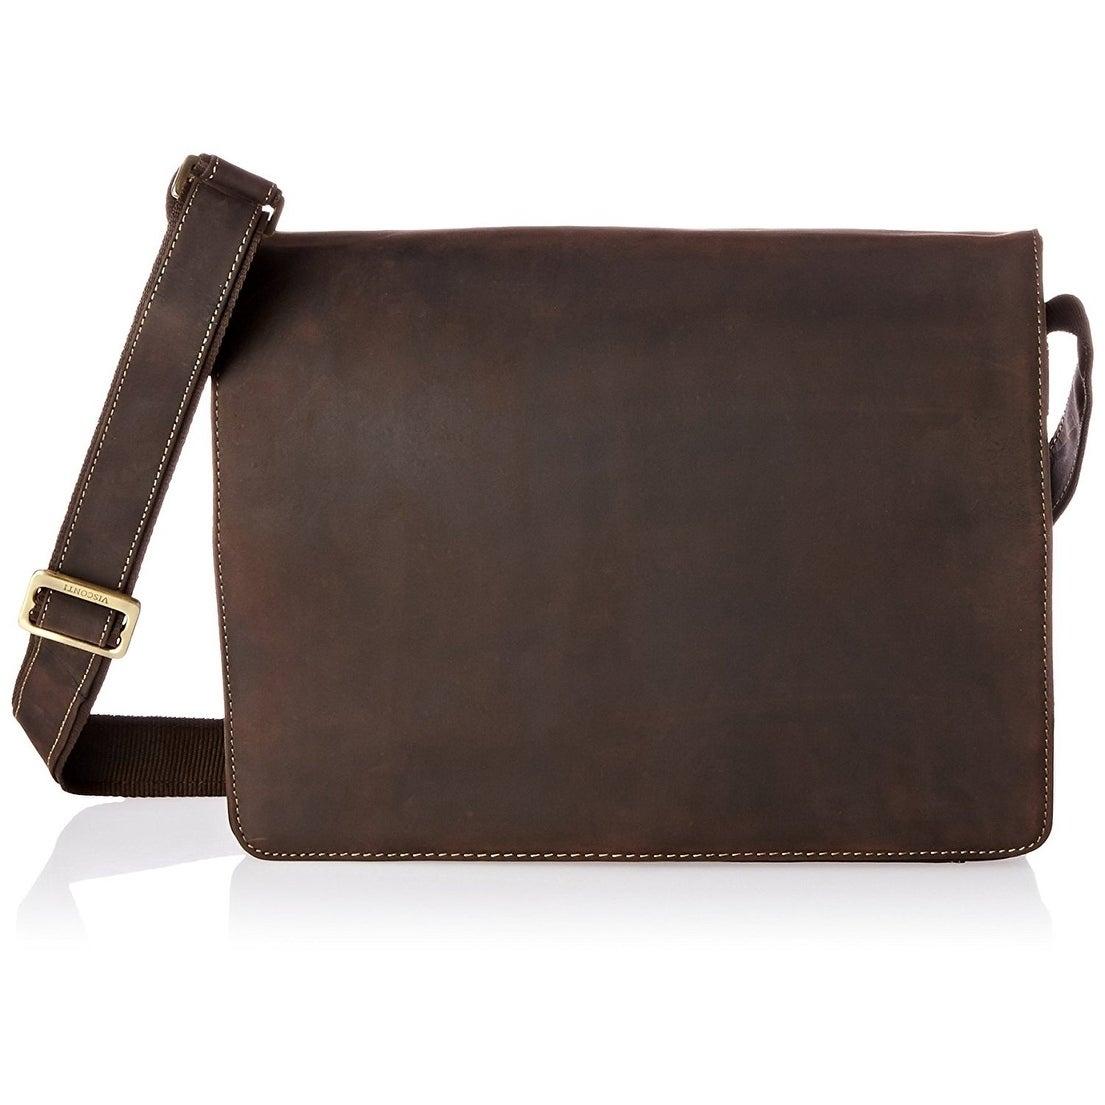 Visconti Distressed Leather Messenger Bag (Cafe), Brown